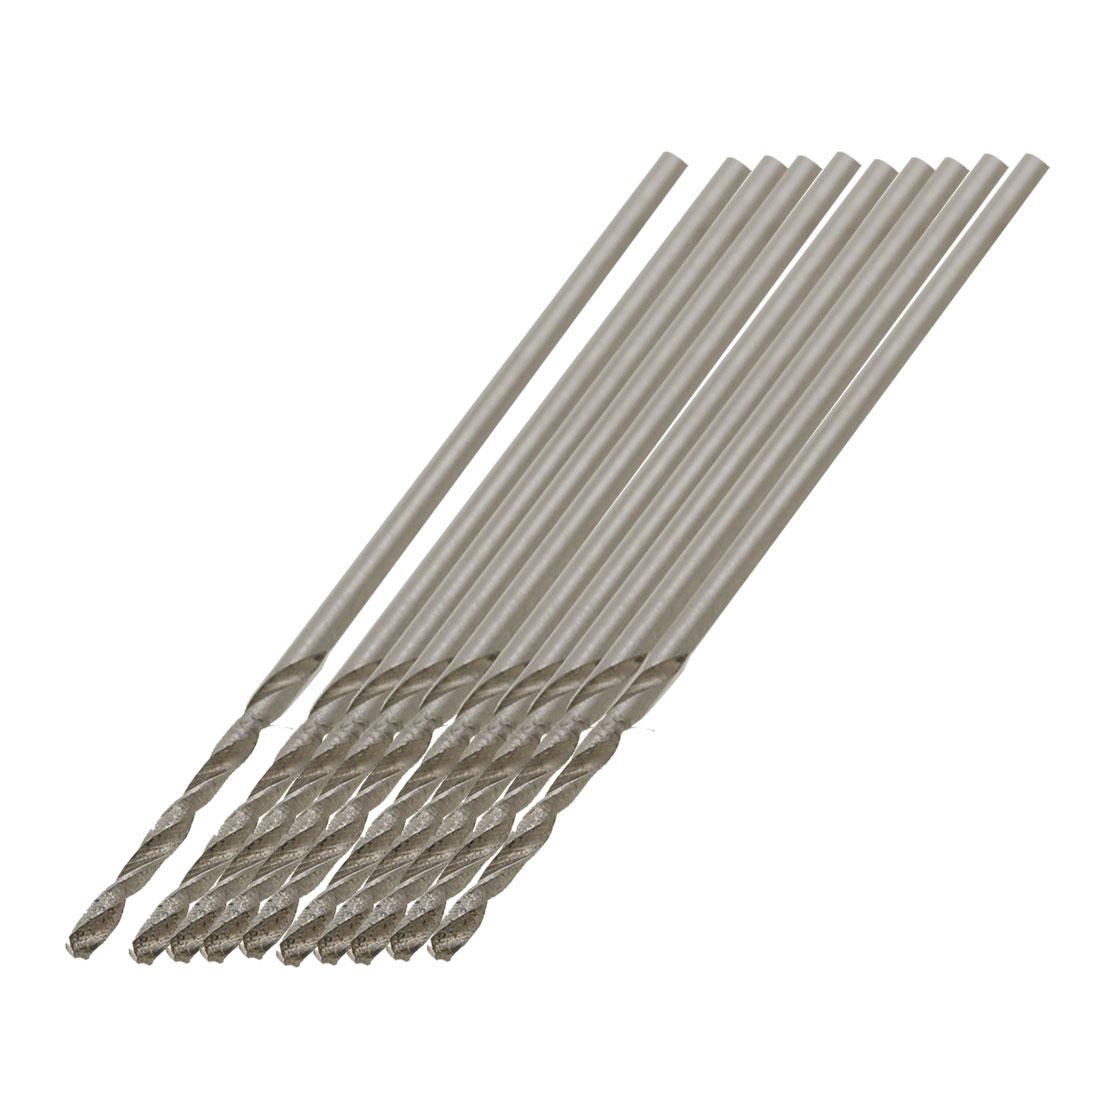 10 Pcs 1mm Dia Split Point Tip High Speed Steel HSS Fully Ground Drill Bits